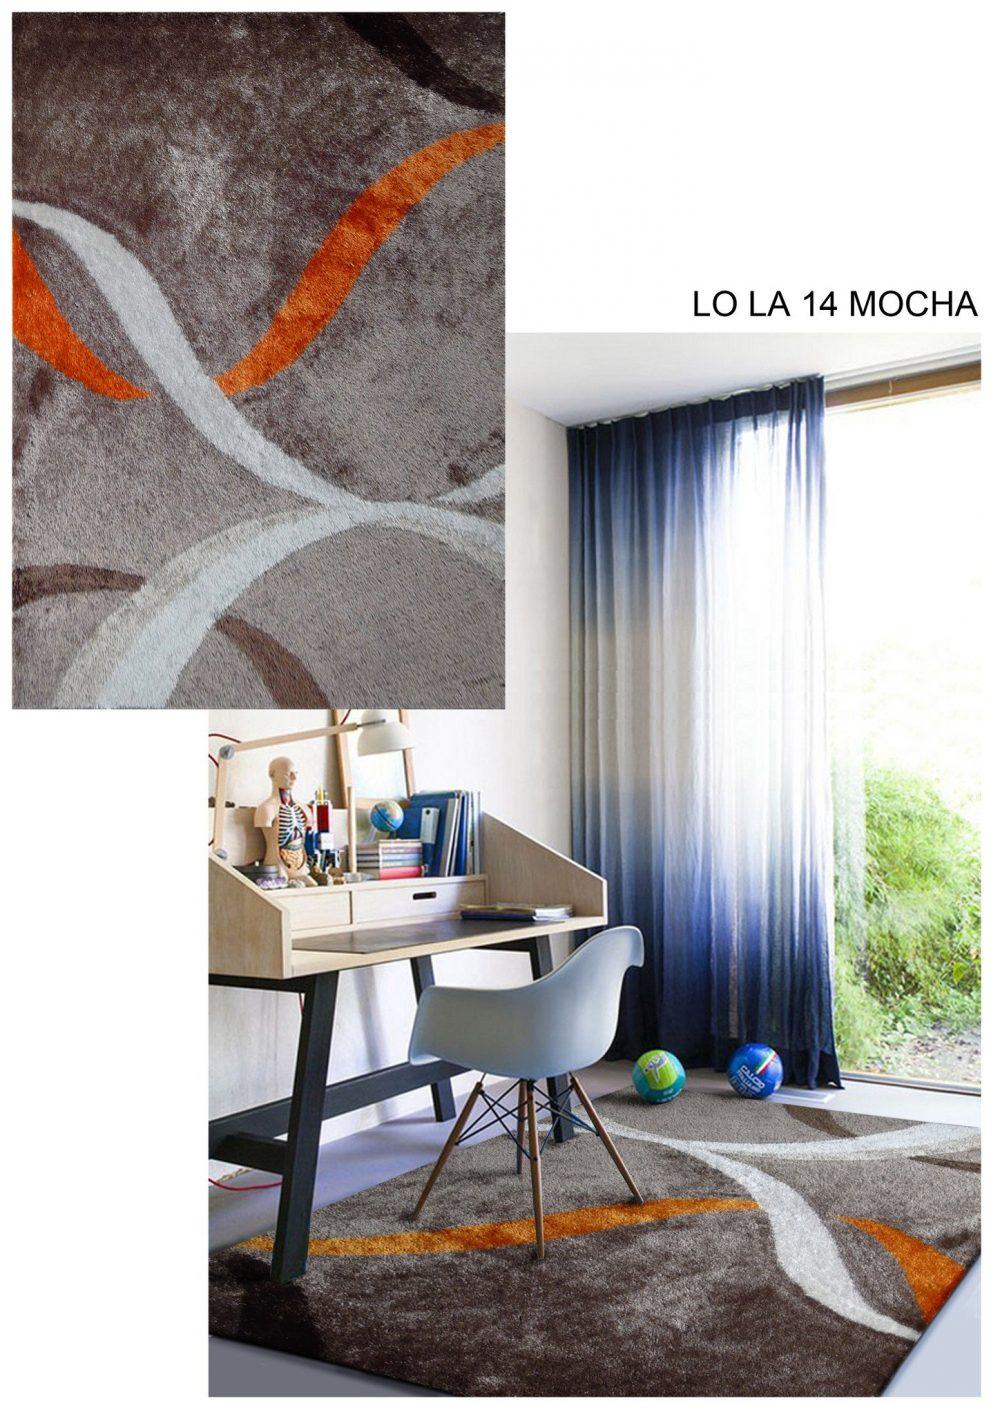 lola 14 mocha orange area rug